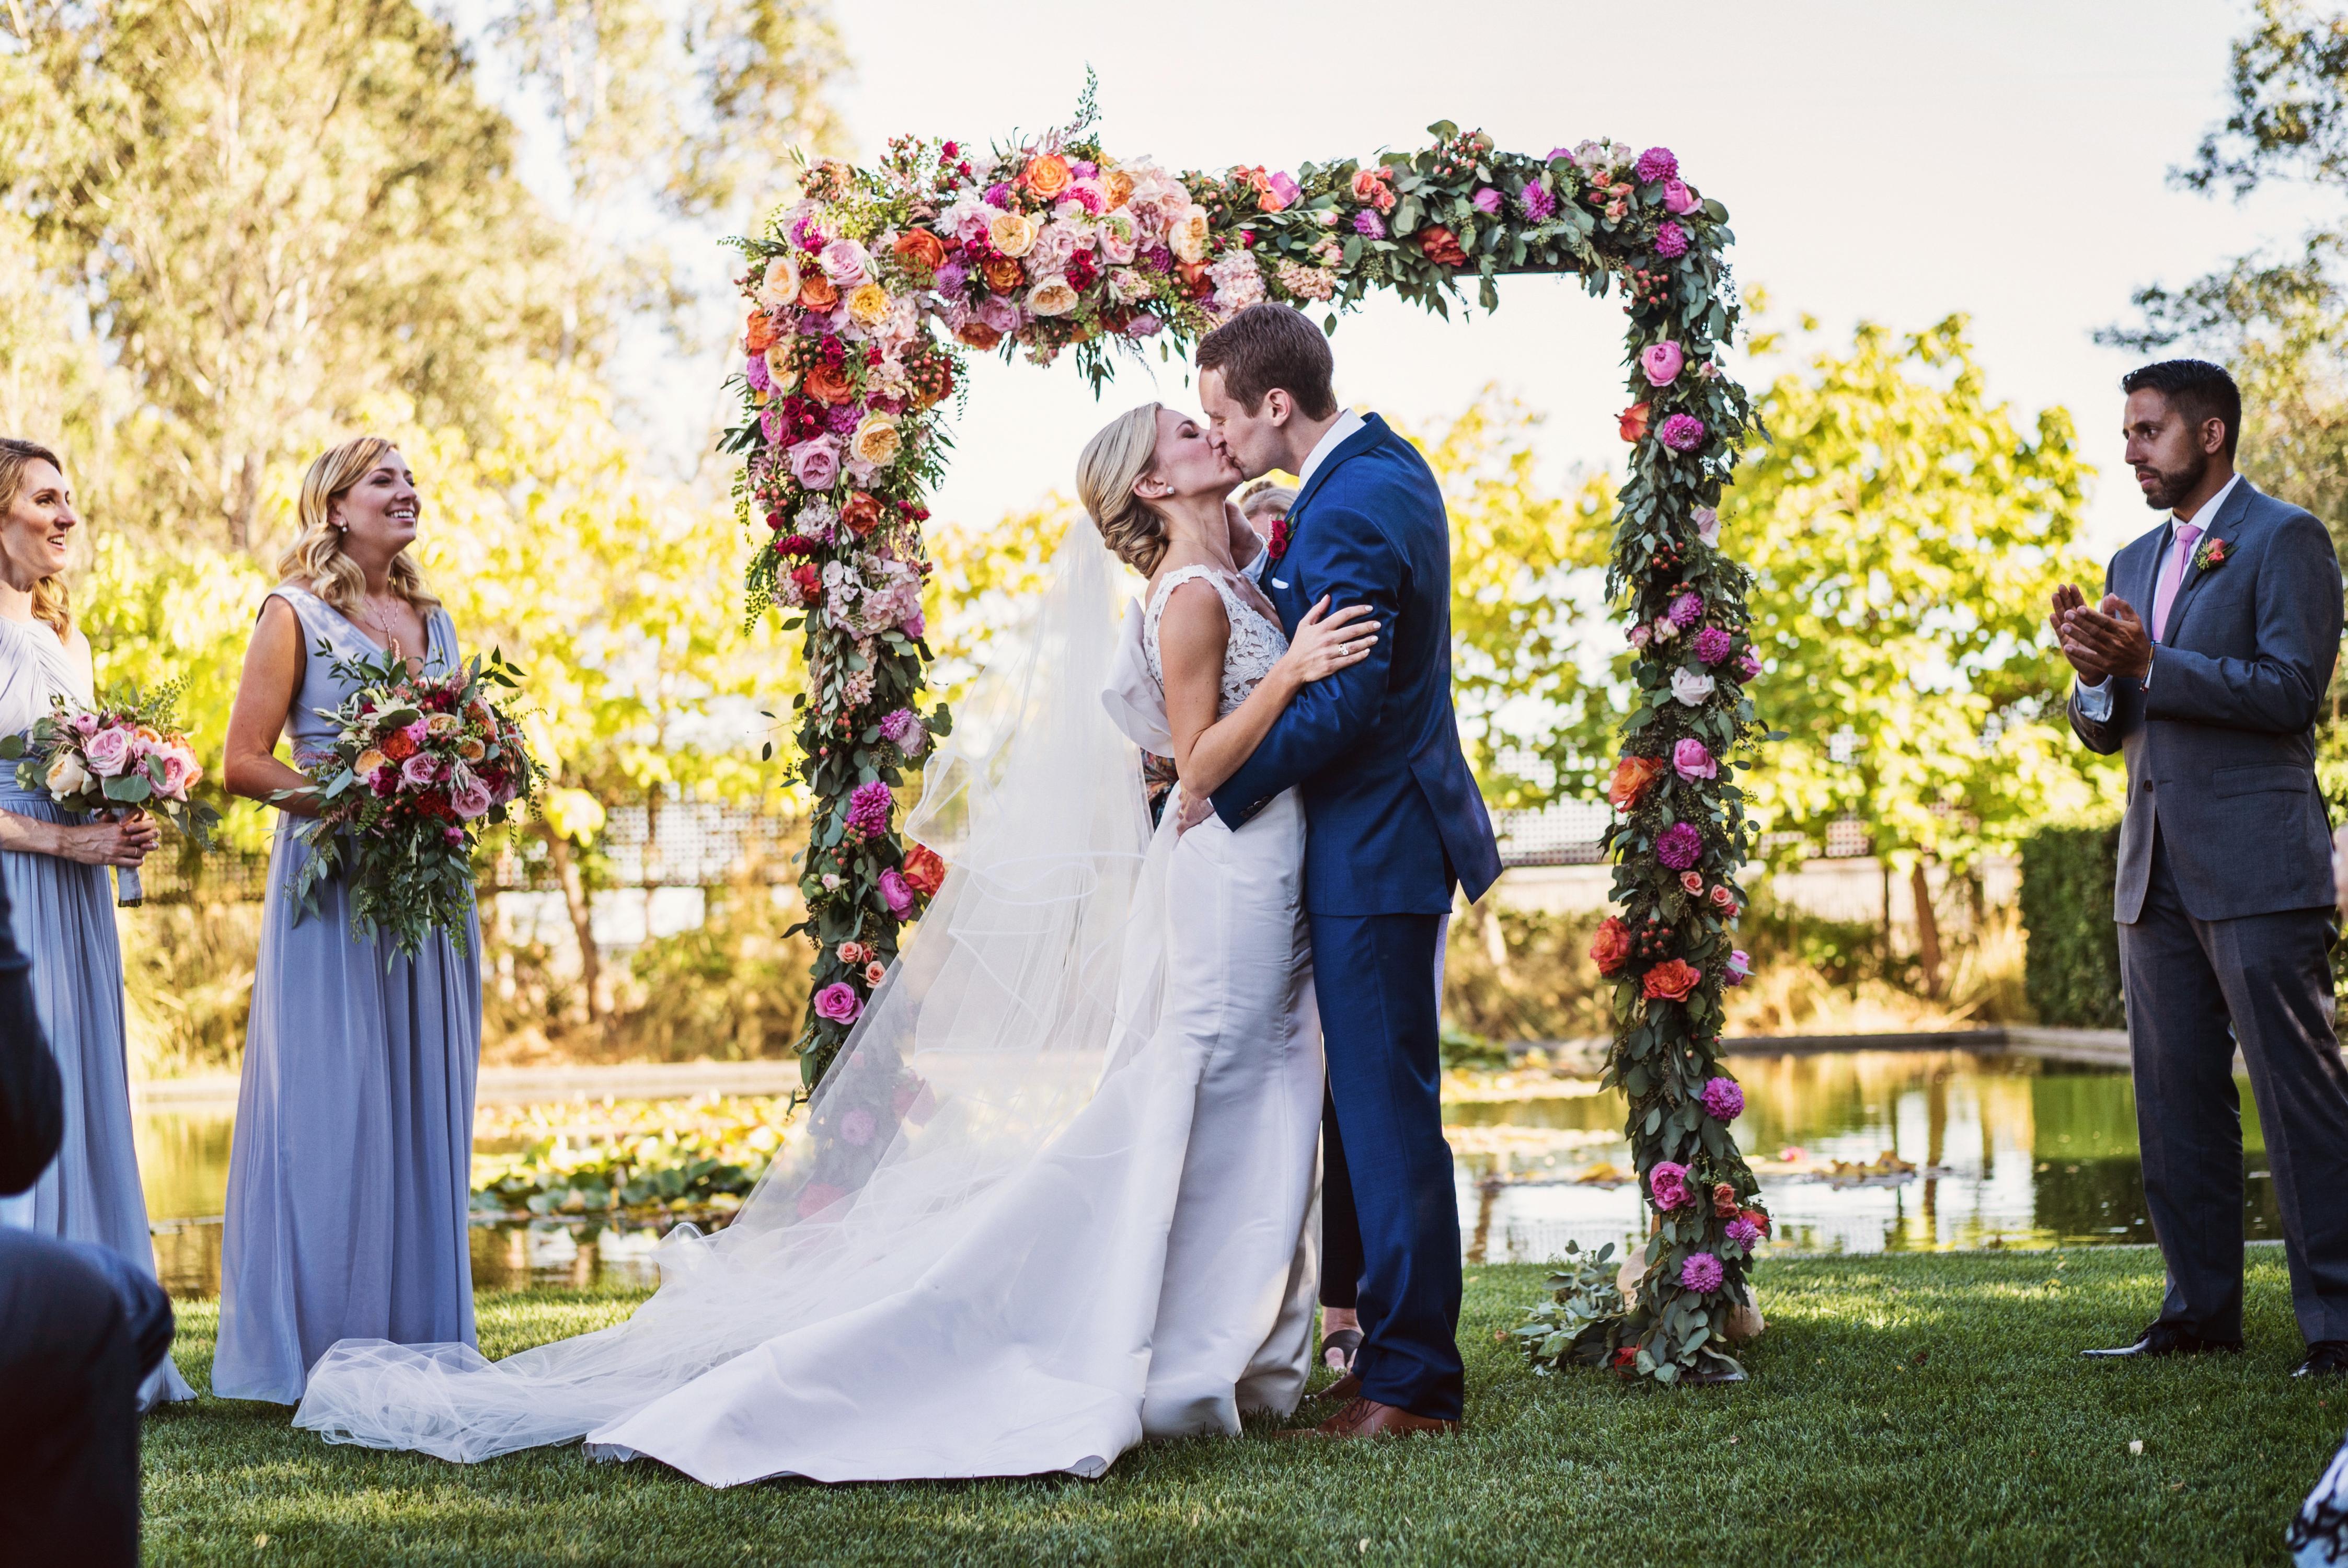 Vibrant Garden Wedding | Cornerstone Gardens Sonoma - Andrew Weeks Photography